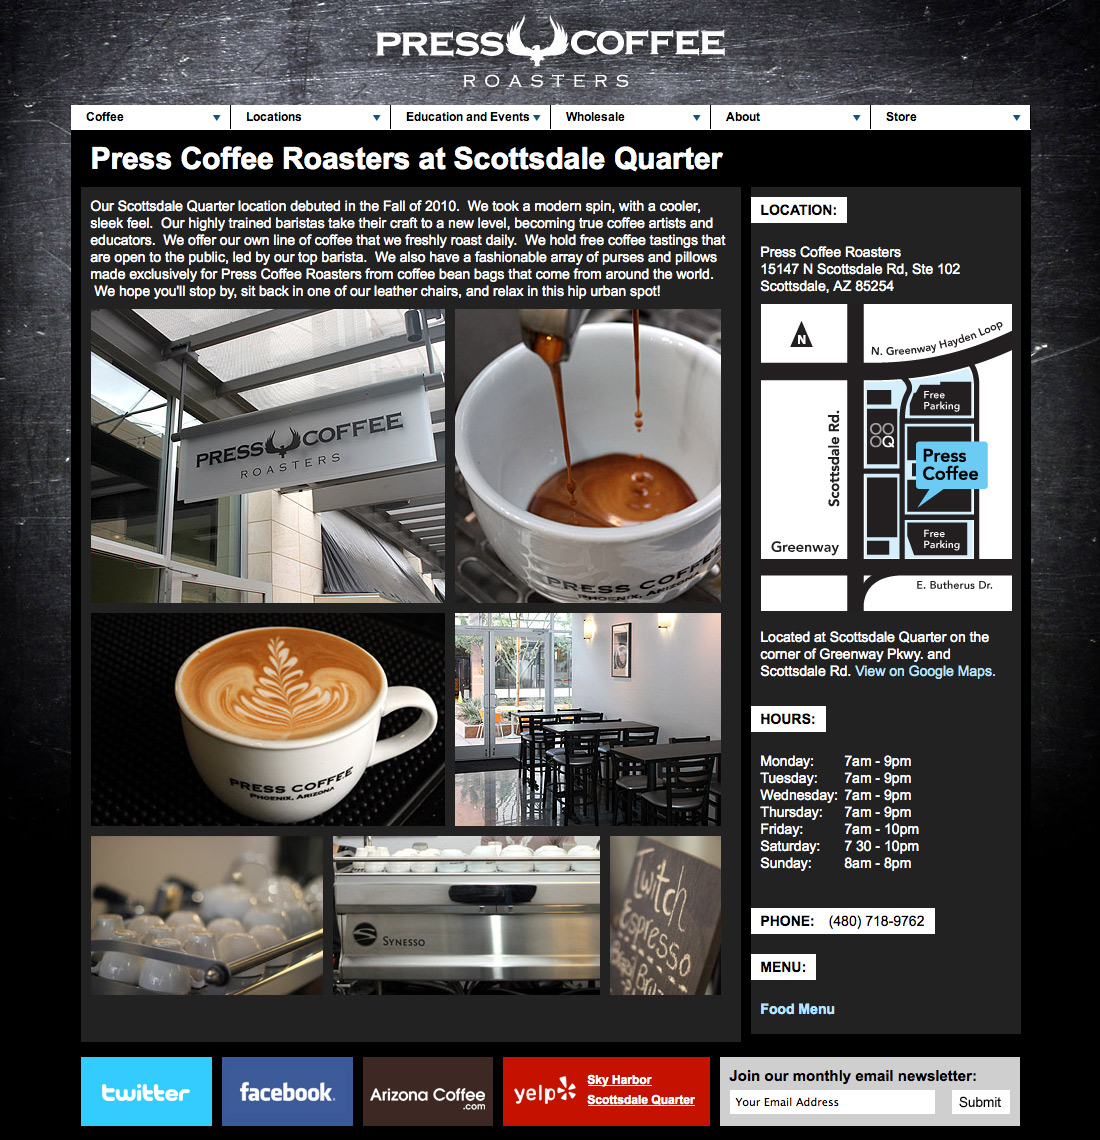 press-coffee-roasters-scottsdale